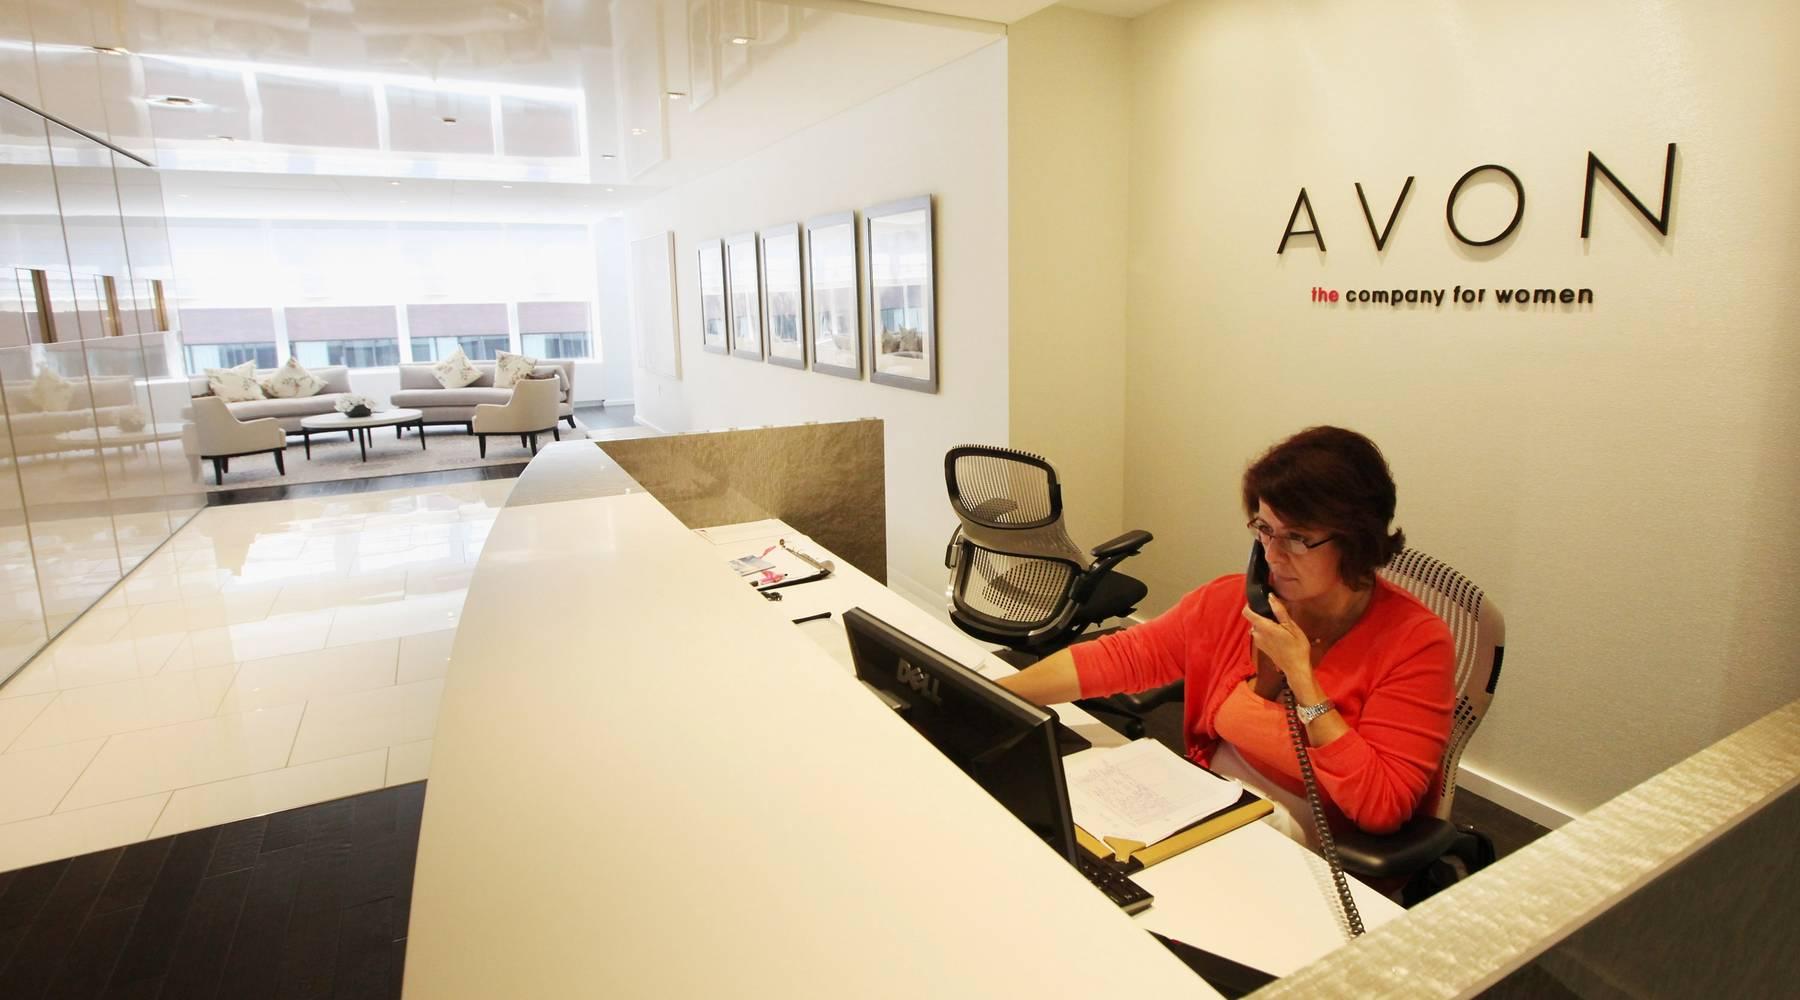 Avon Customer Service Opening Times